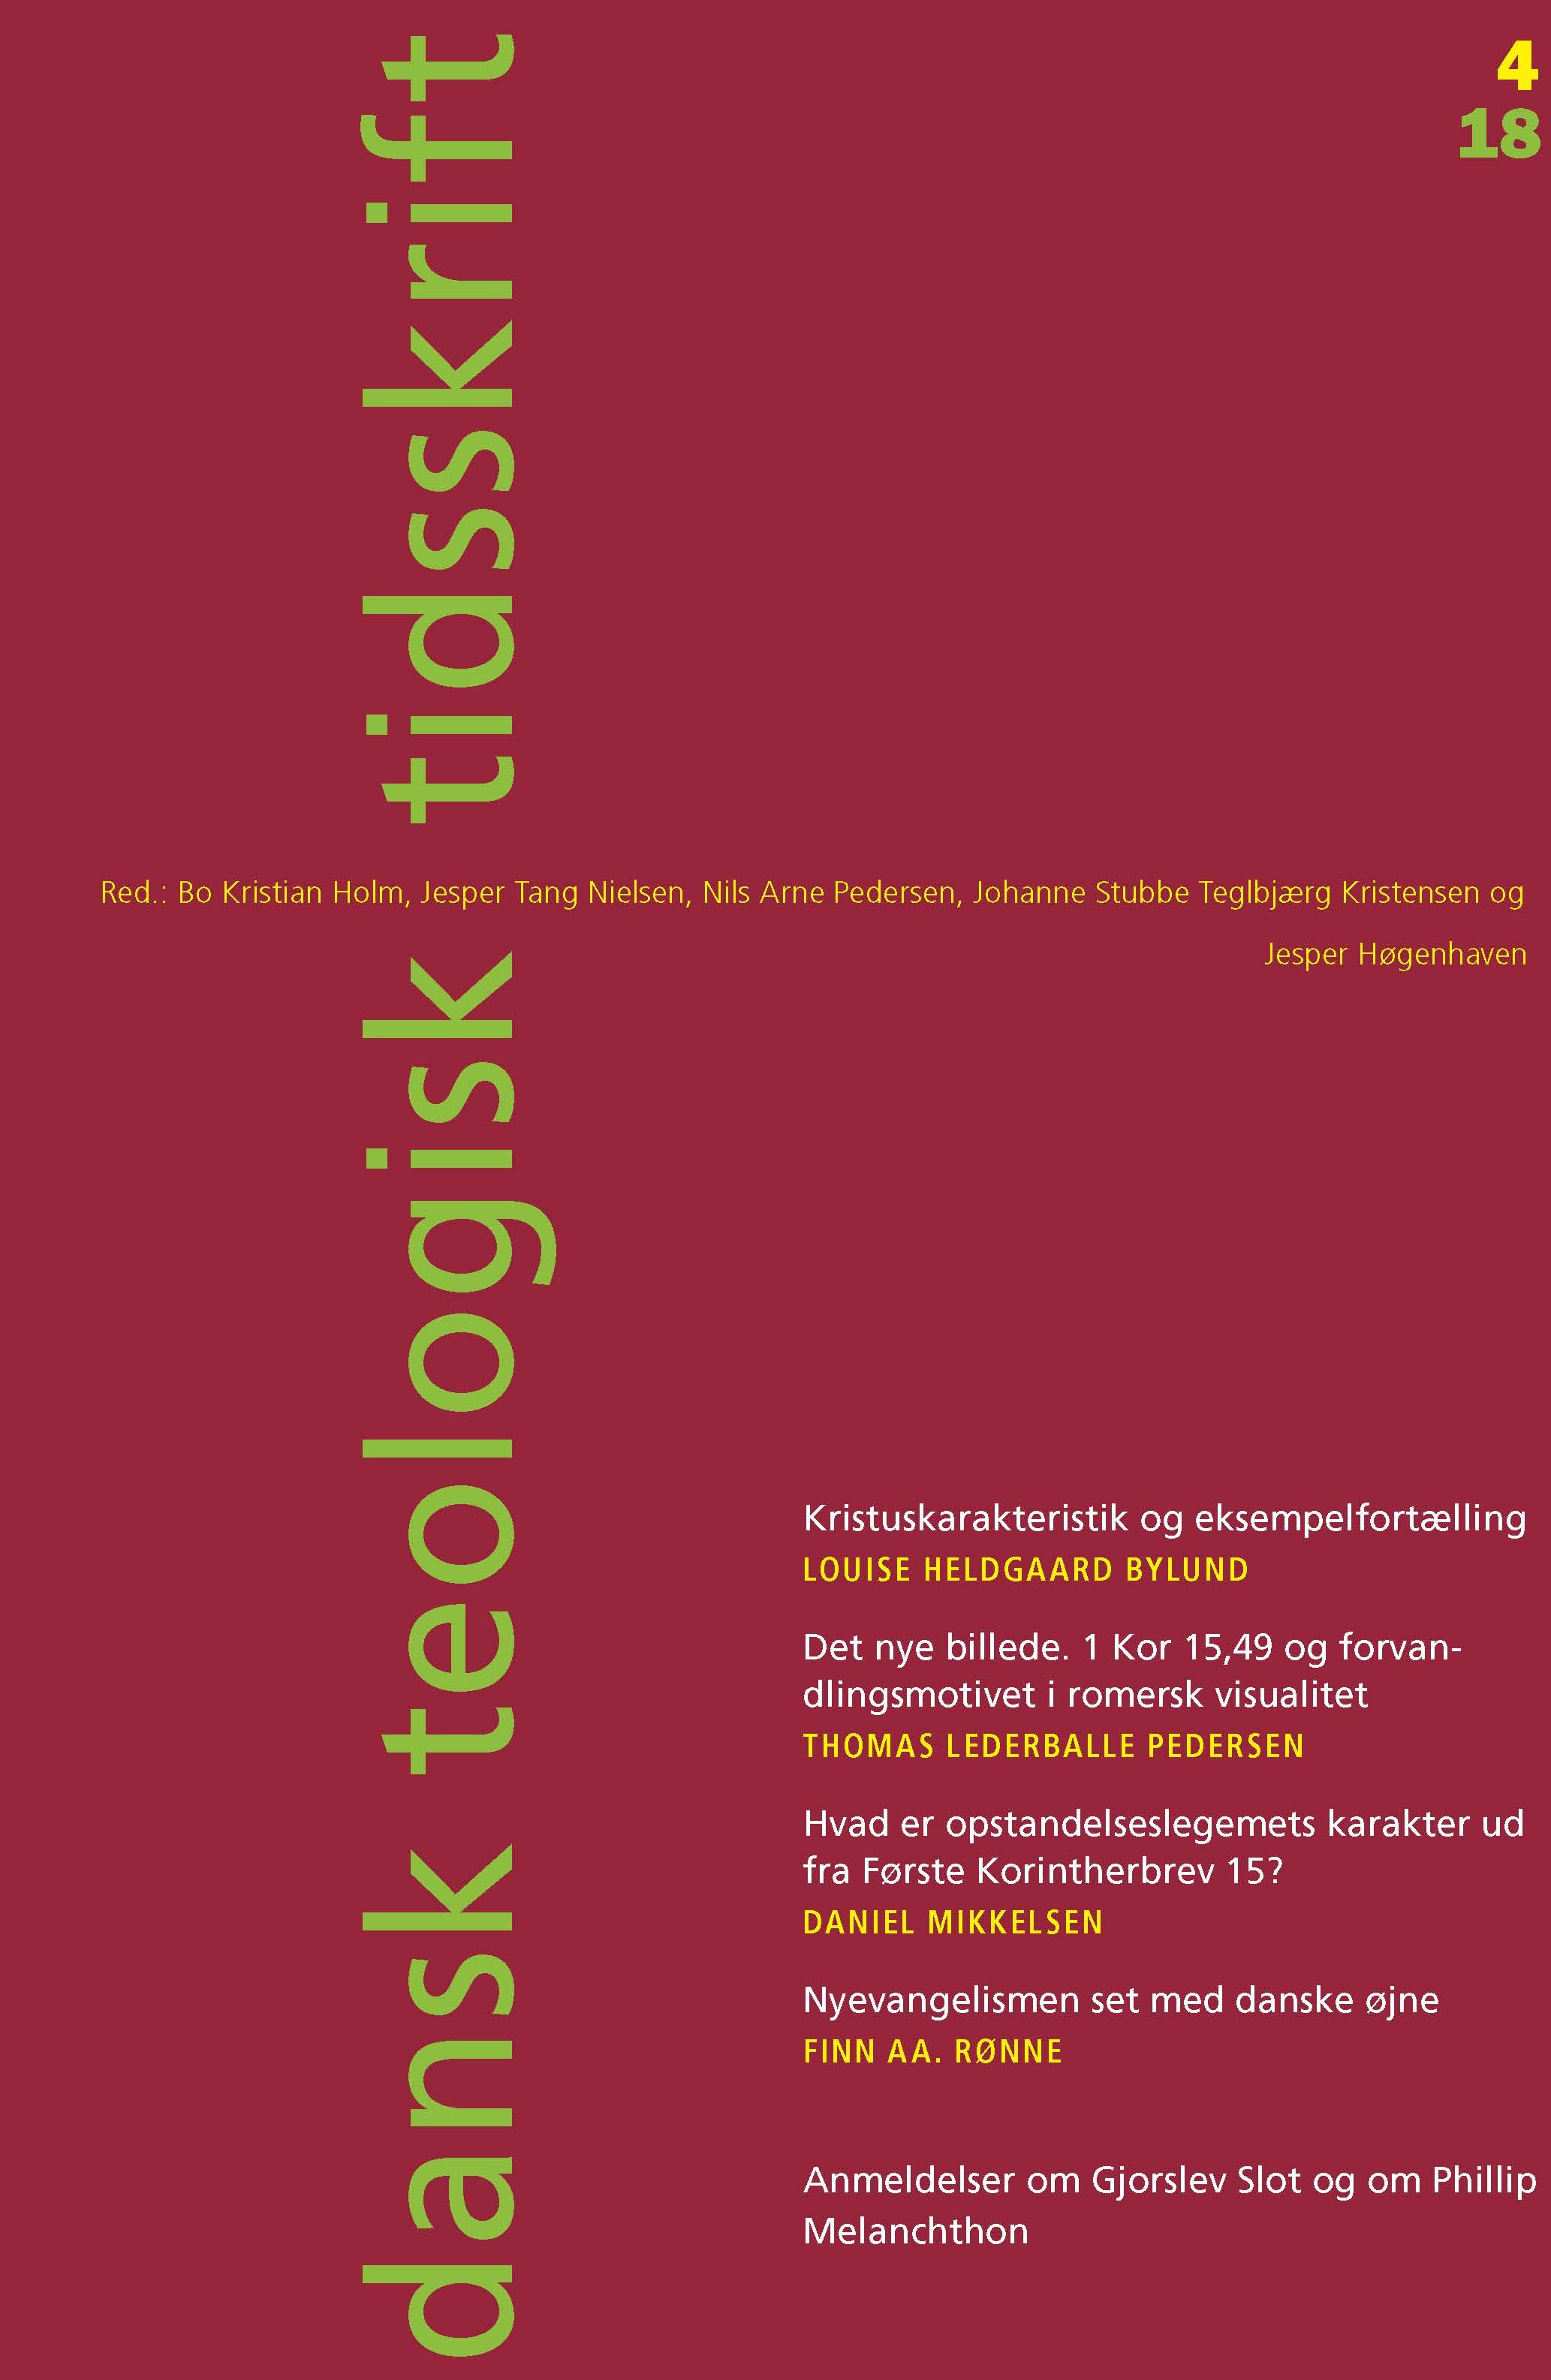 Dansk Teologisk Tidsskrift nr. 4, 2018